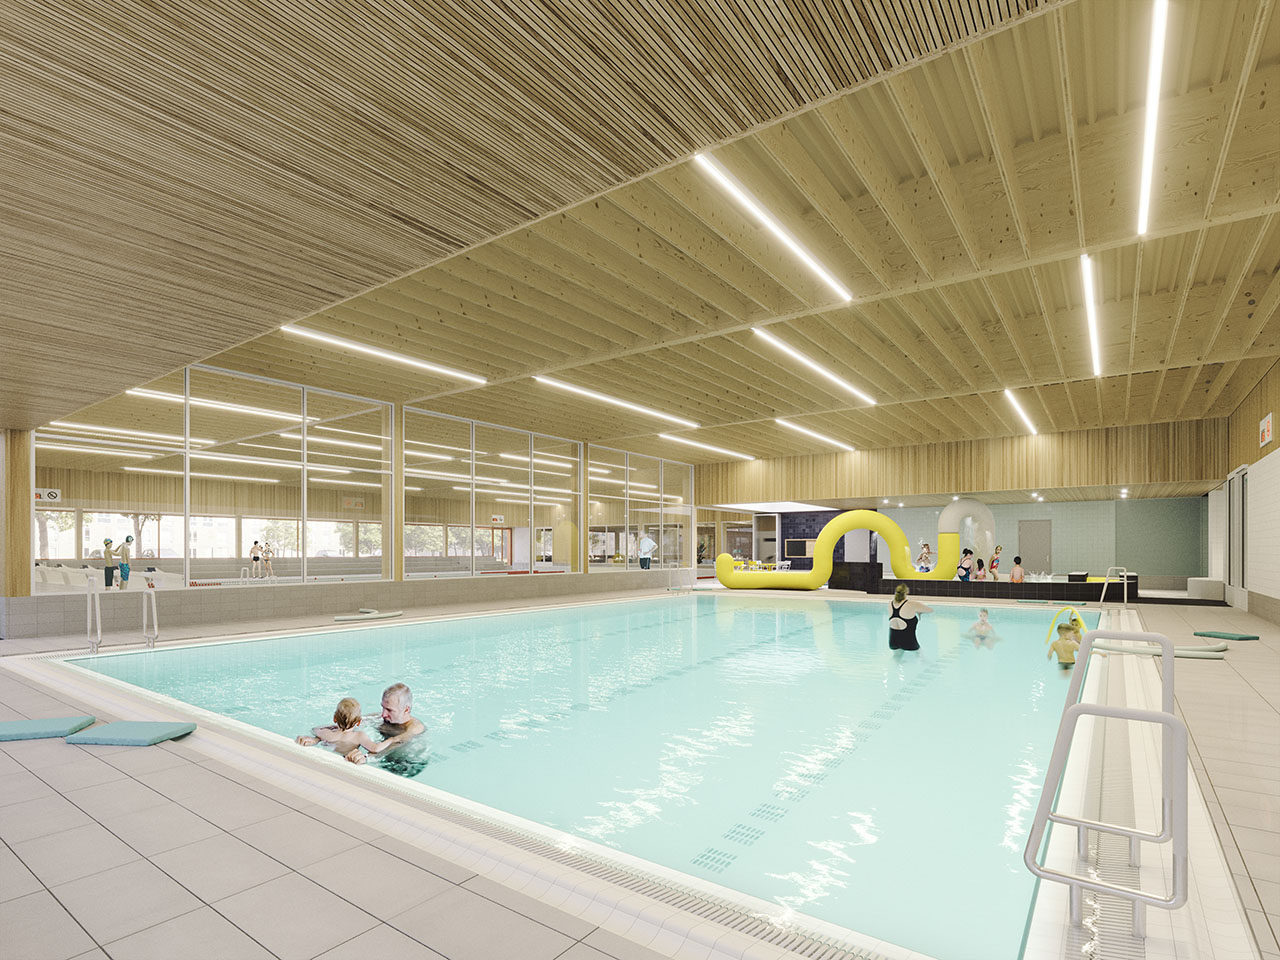 Sportcomplex Zaltbommel